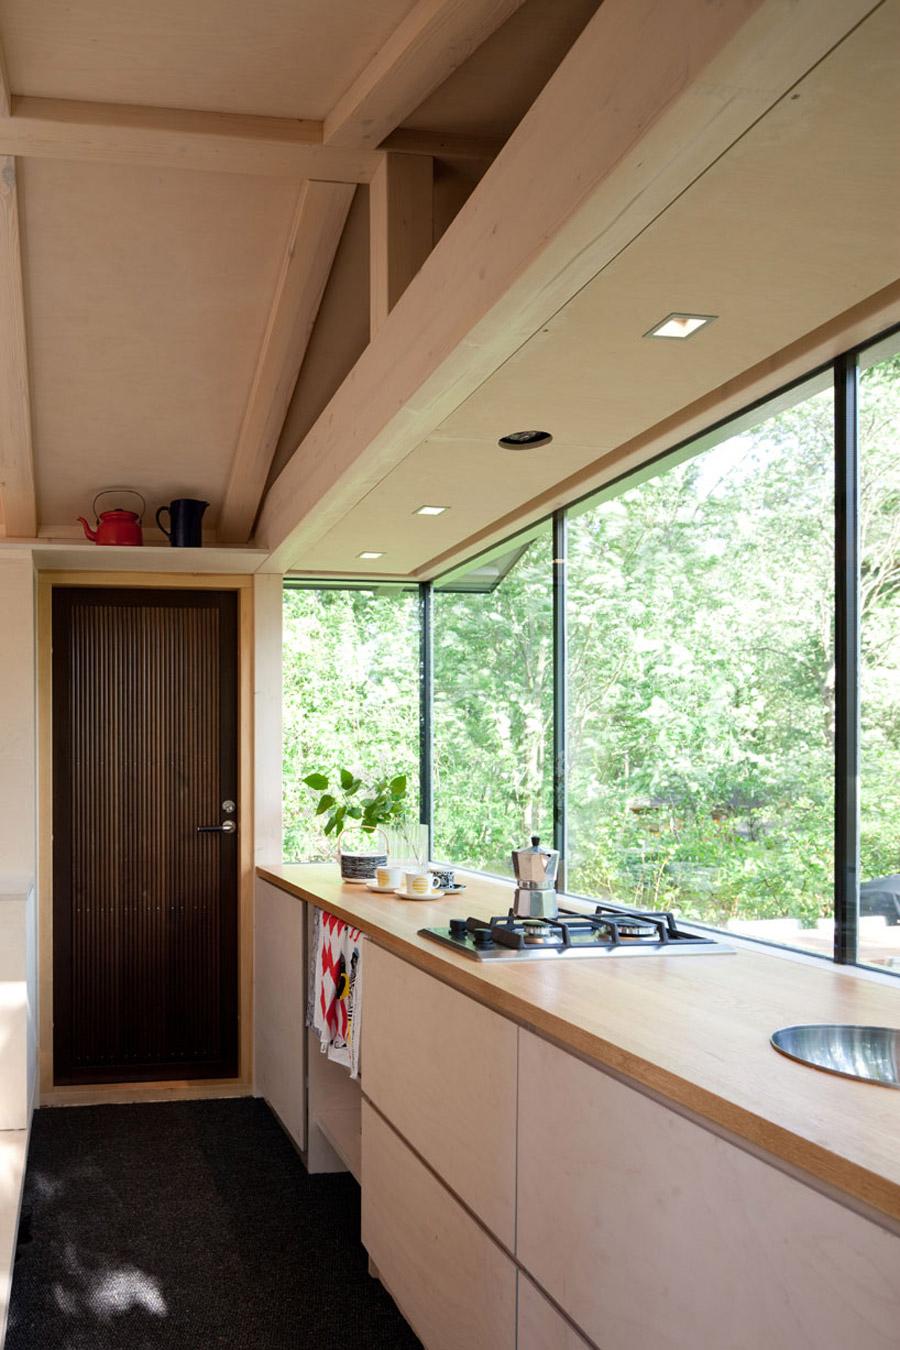 city-cottage-verstas-architects-4